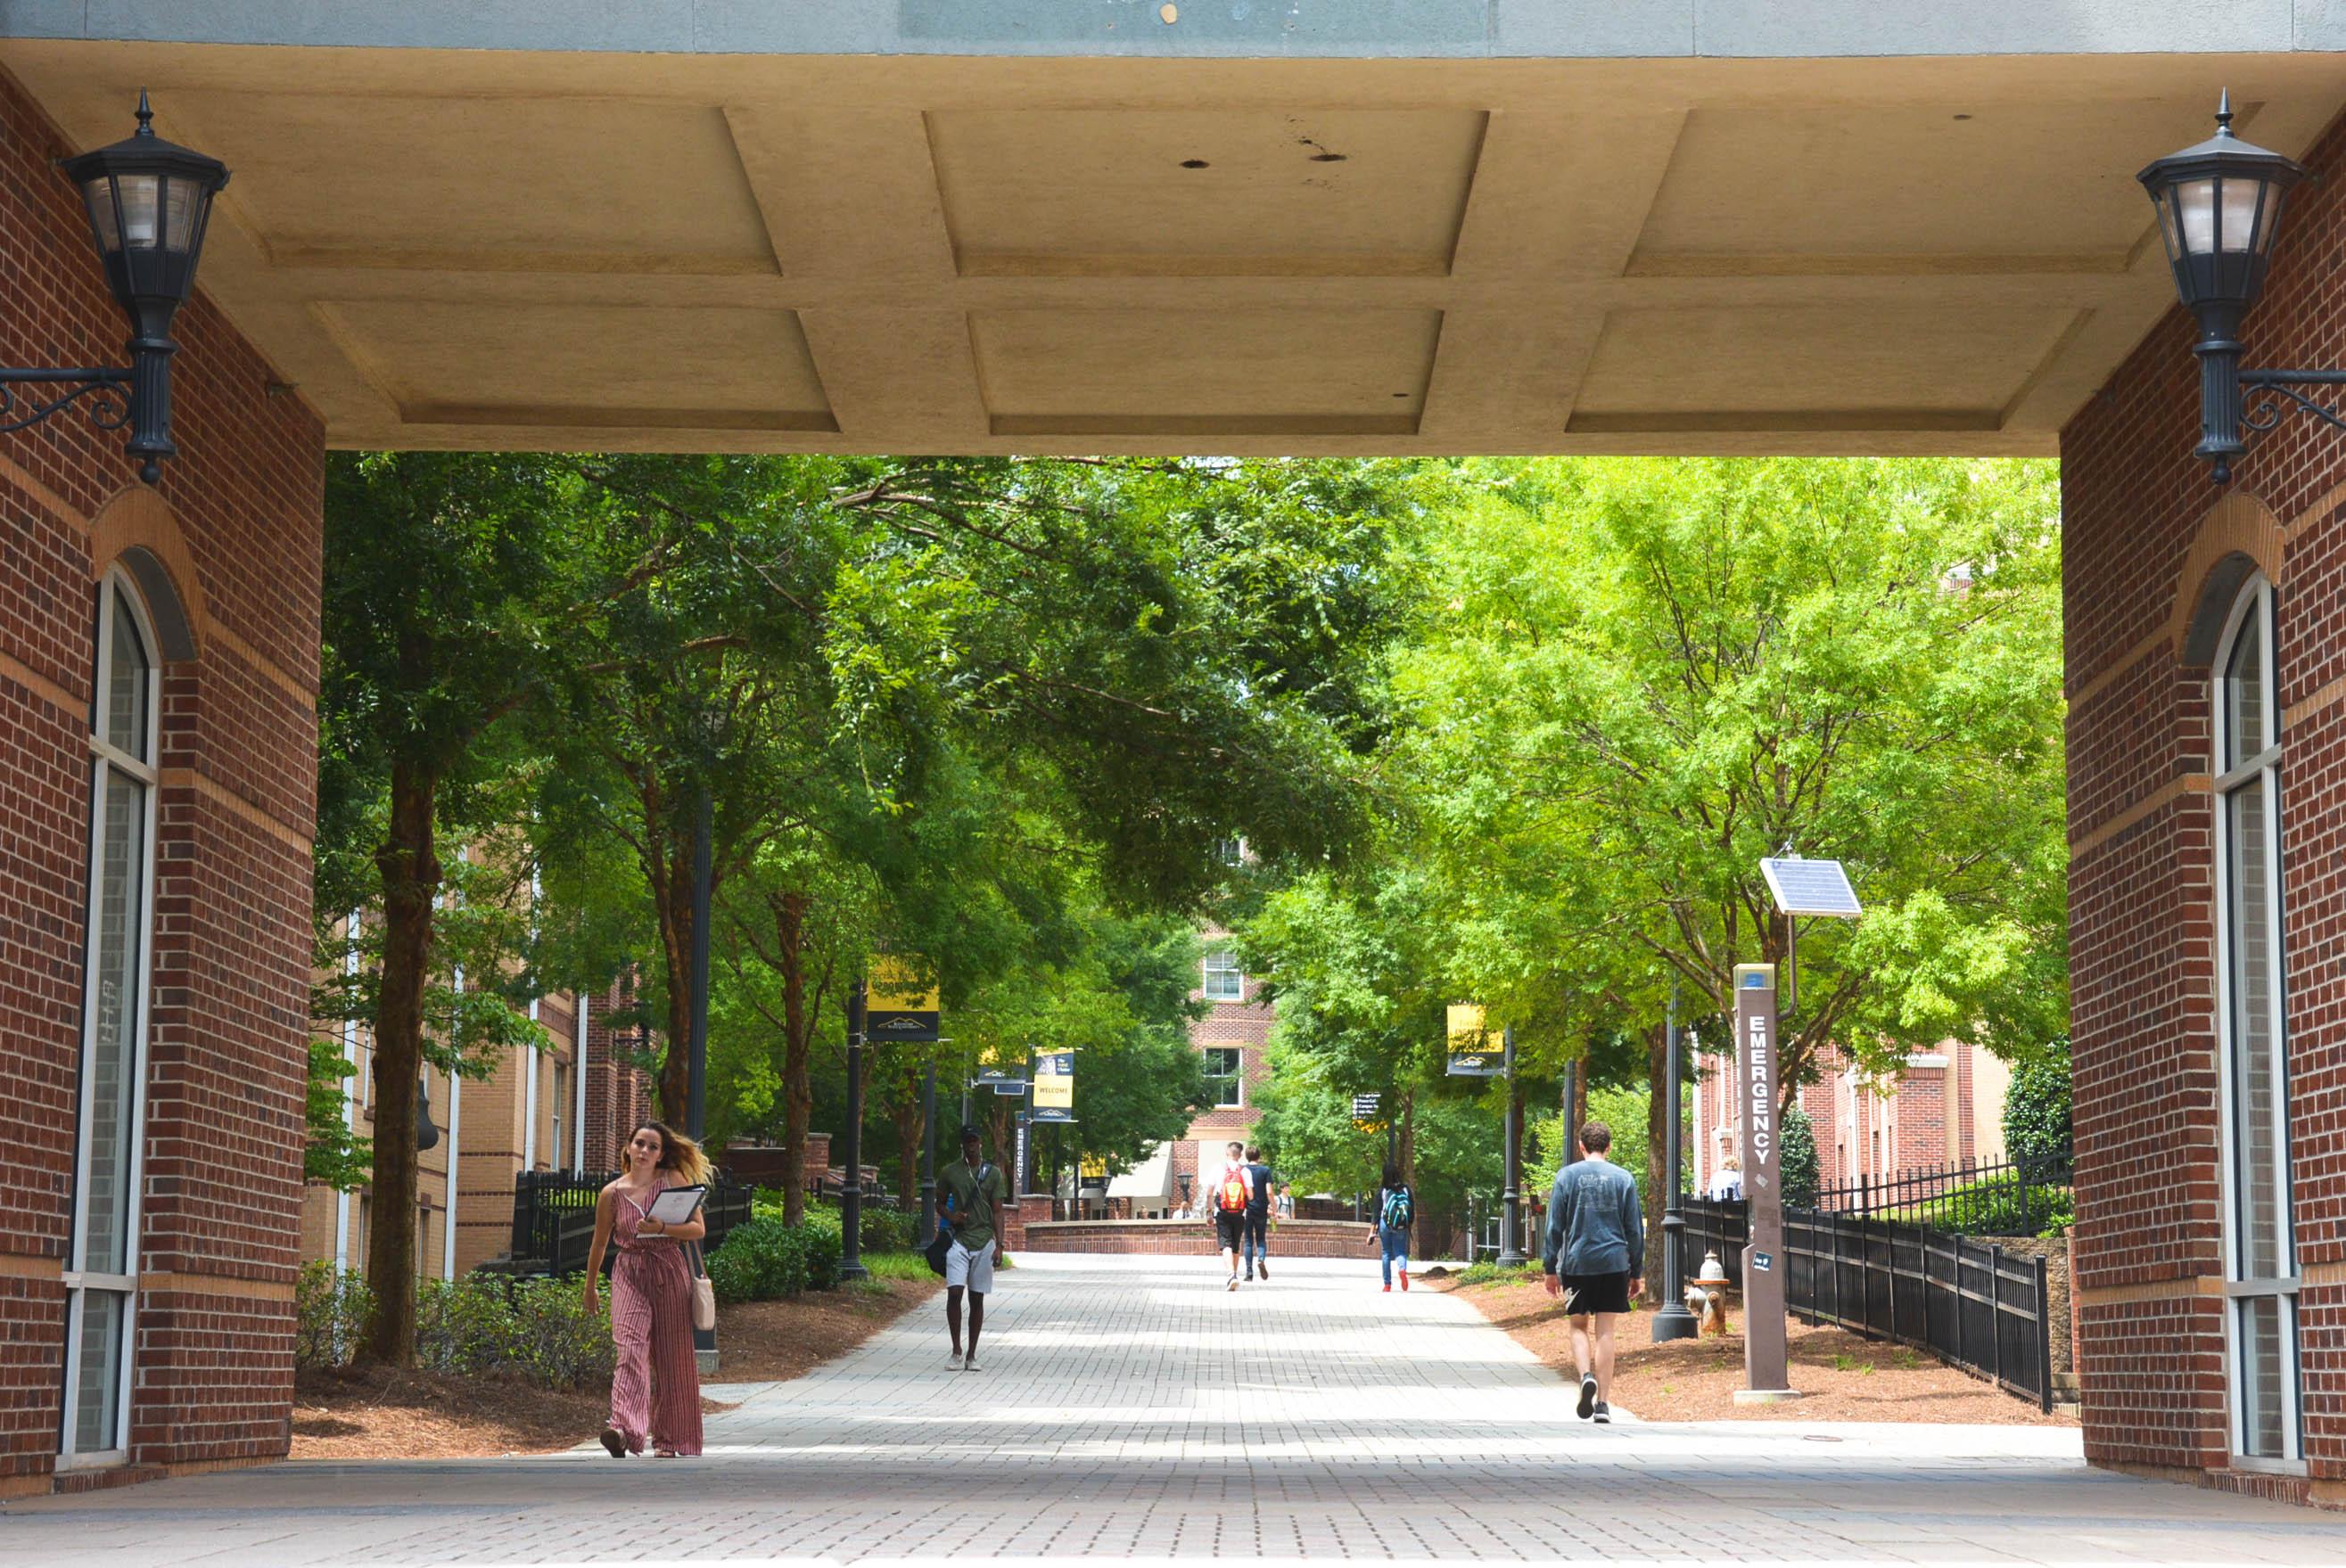 KSU professor earns column excellence award